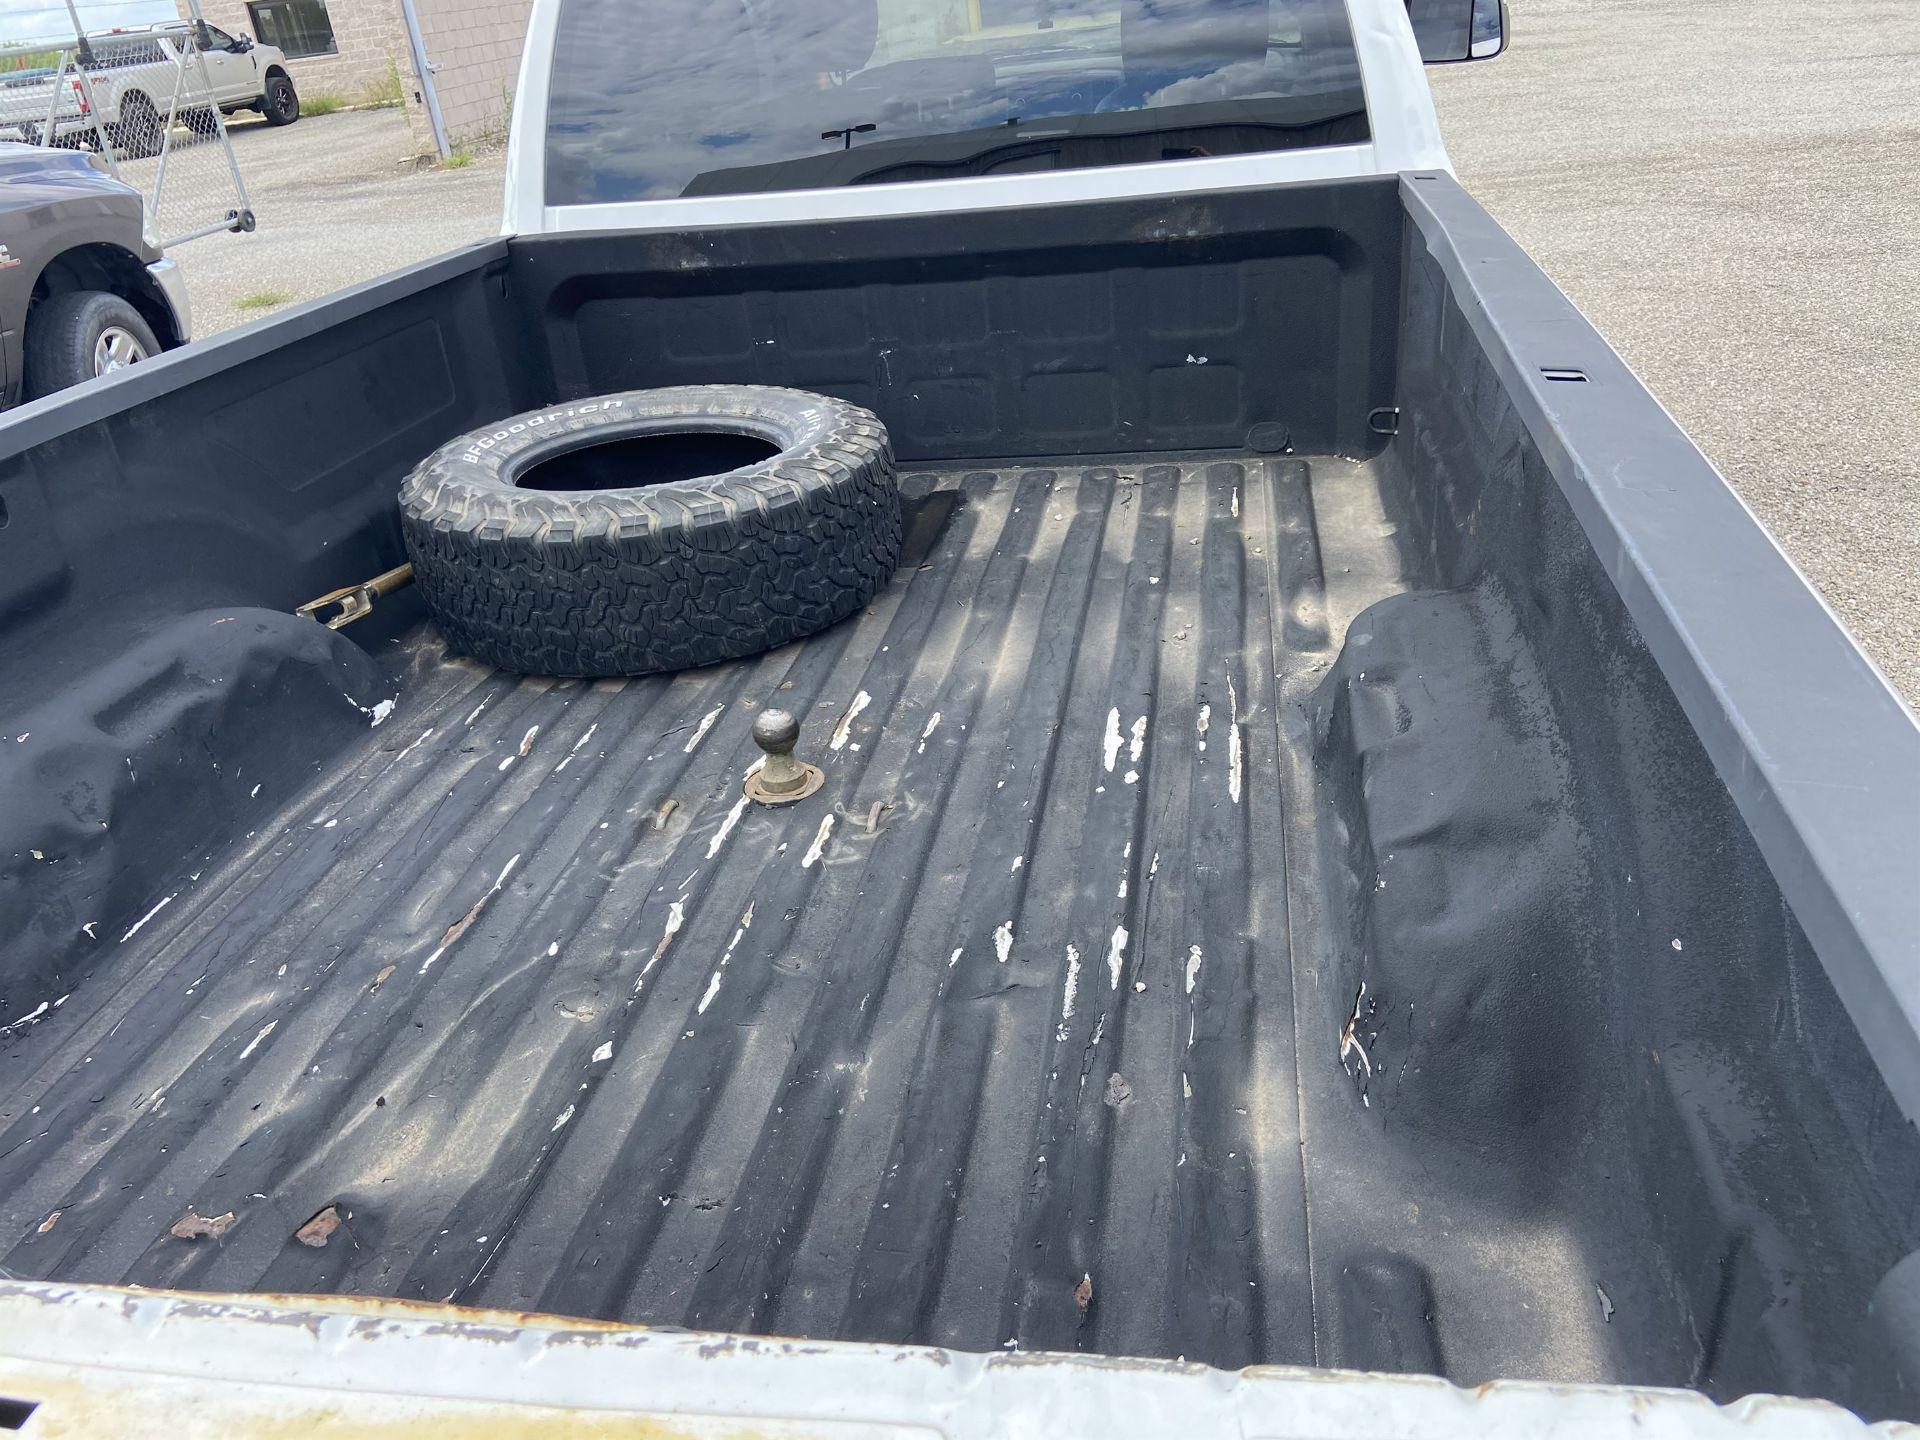 2011 Dodge Ram 2500 HD Crew Cab Long Bed, 212k Miles, Vinyl, 4x4, Gas, VIN # 3D7TT2CT9BG626009 - Image 14 of 16